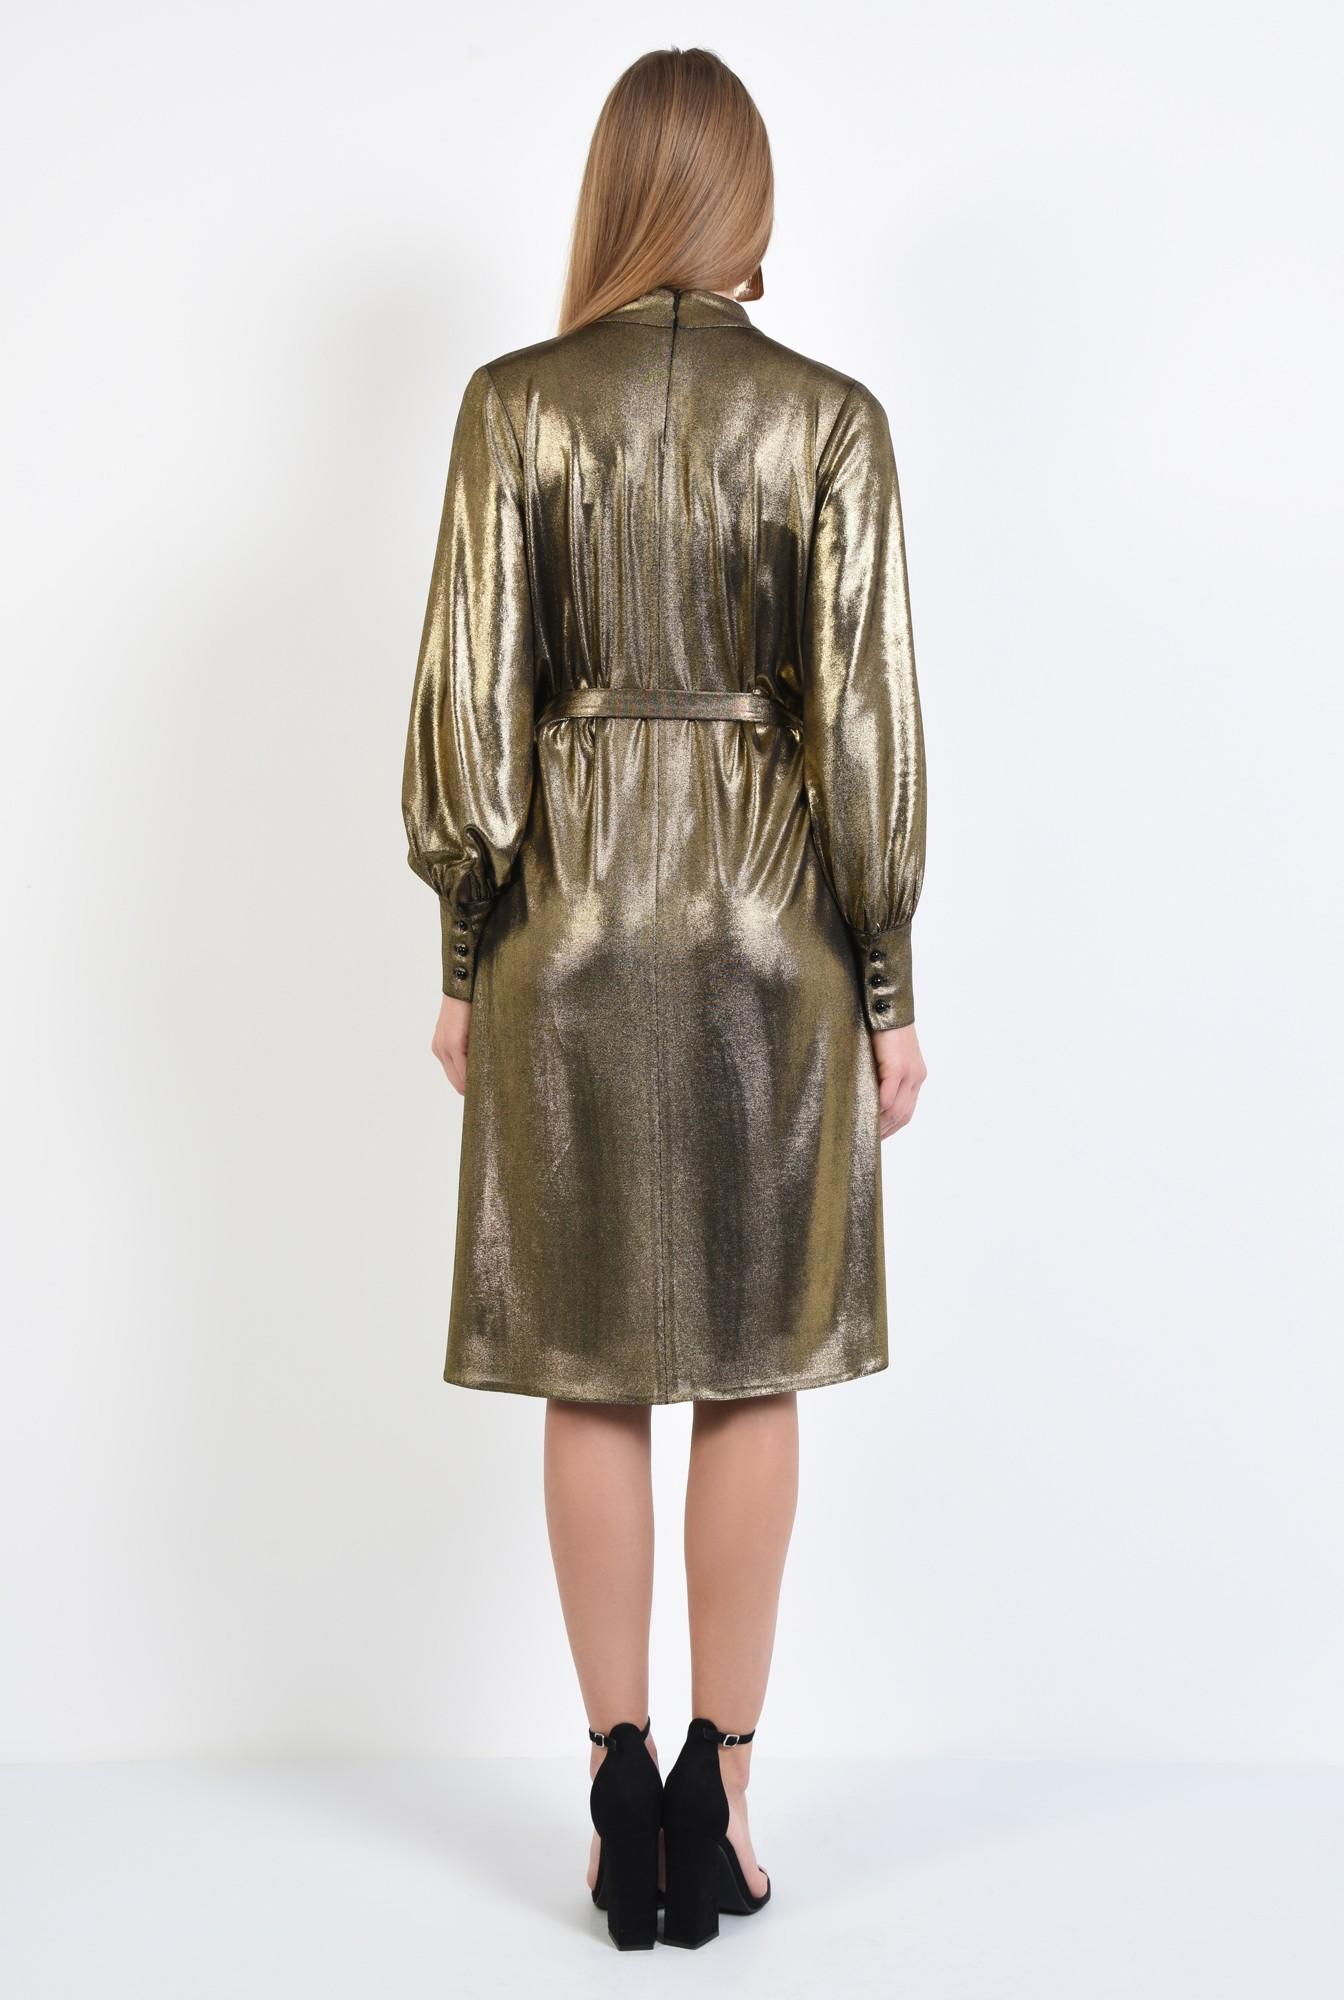 1 - rochie de ocazie, din lurex, aurie, cu crapeu